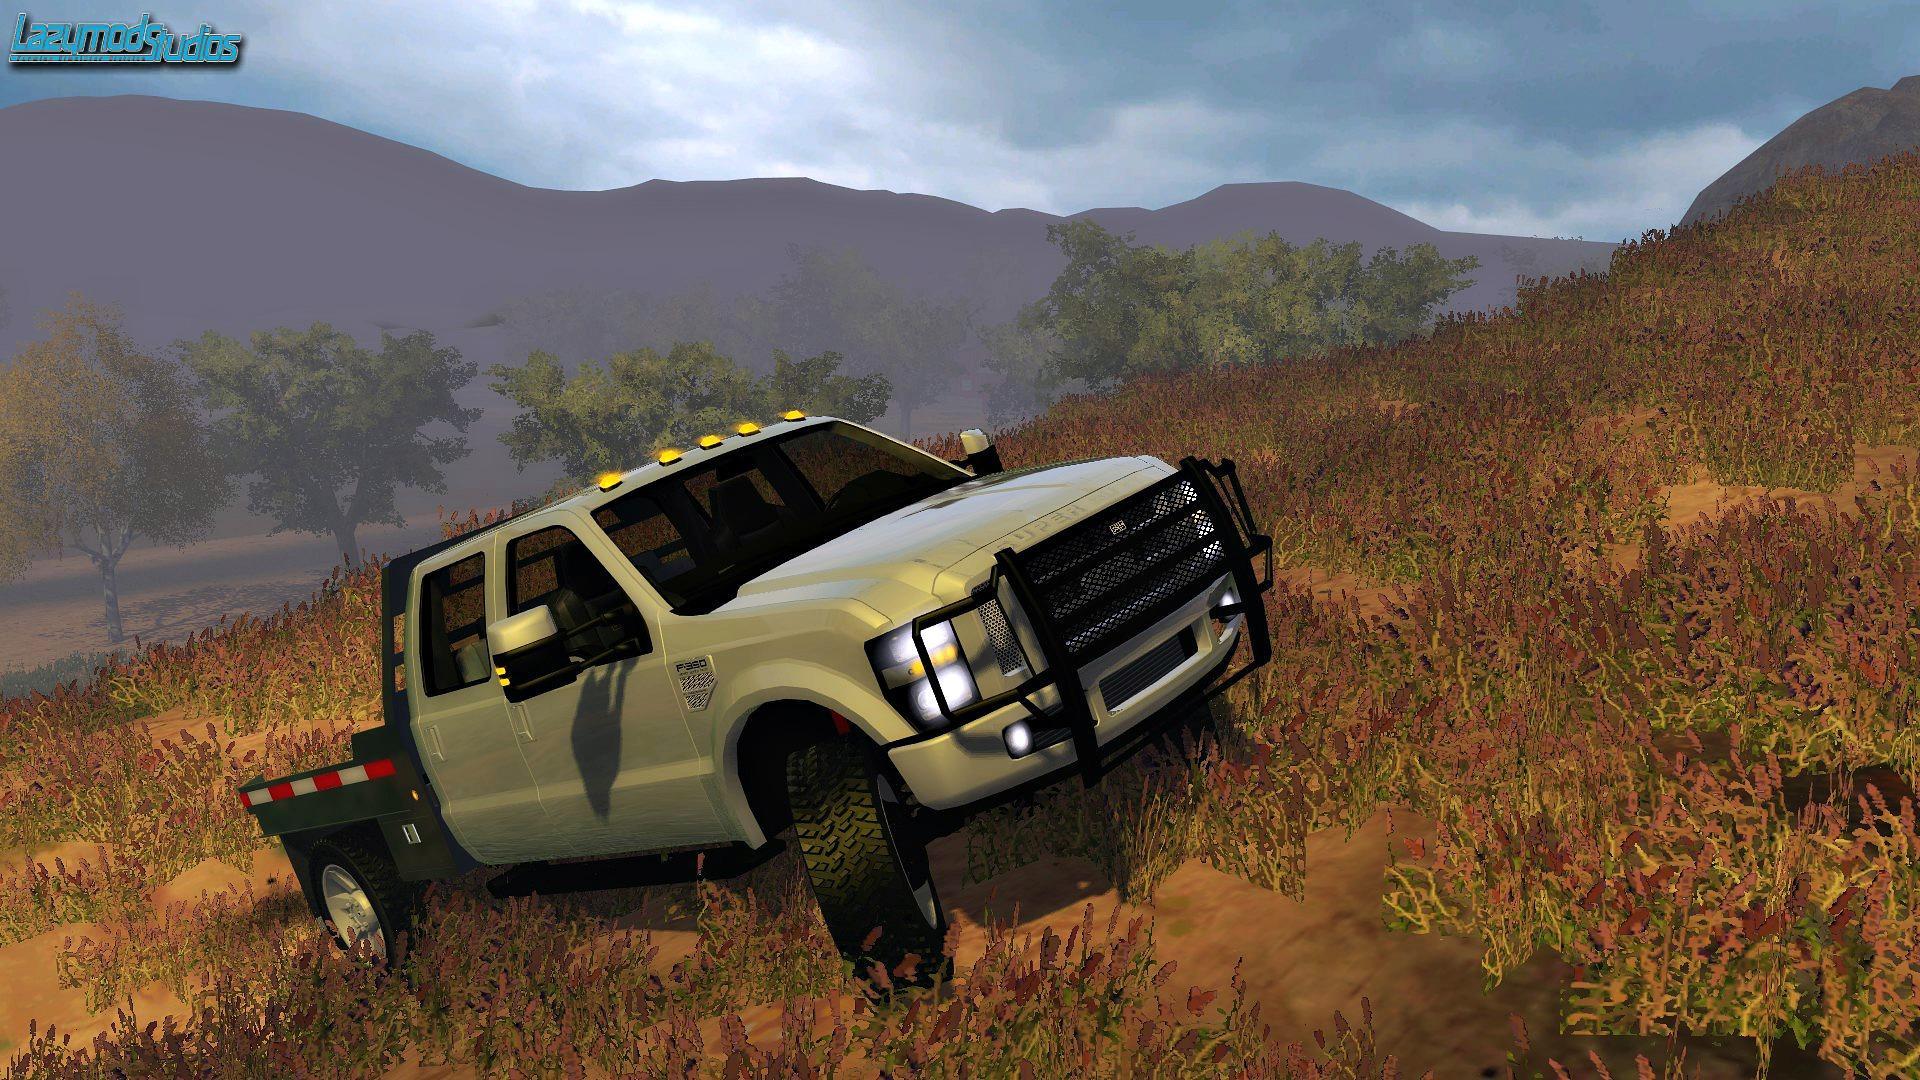 Modhub Landwirtschafts Simulator 2013.html | Autos Weblog